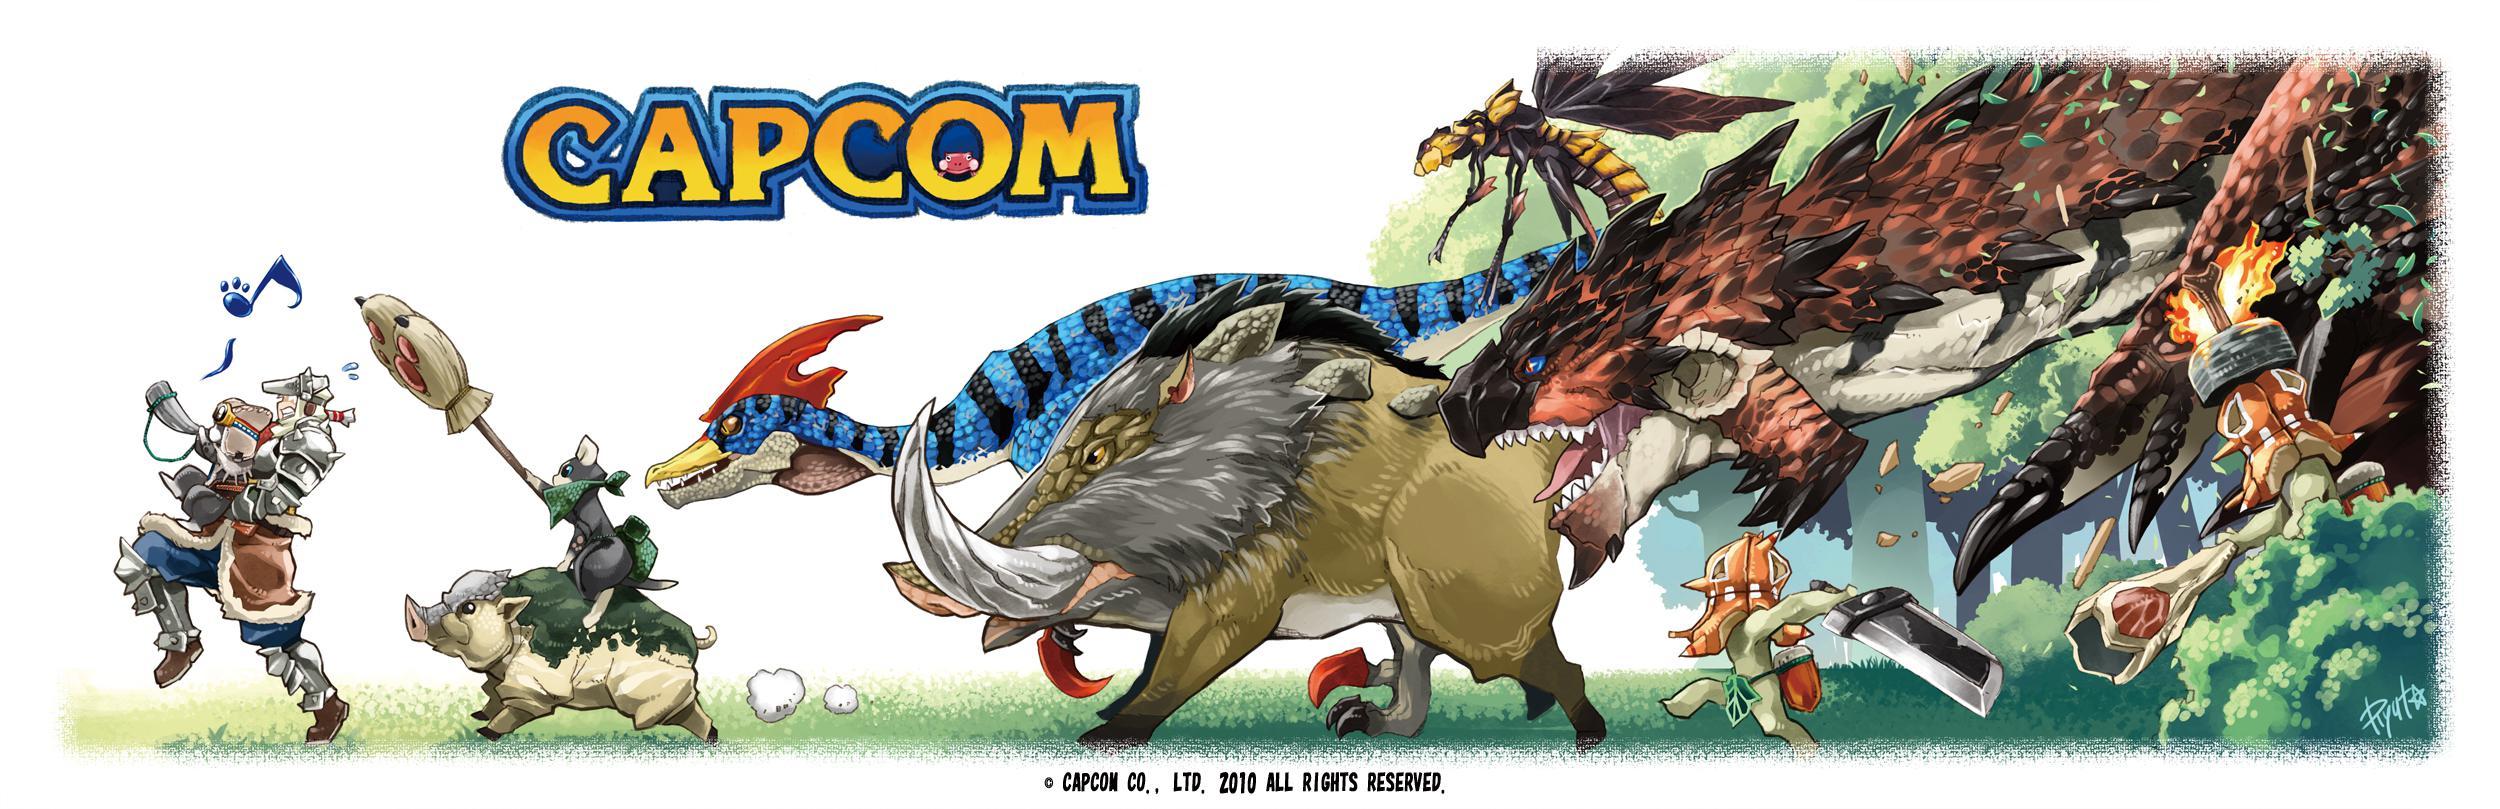 MHW到来之前,这部漫画尝试描绘了猎人们的梦想